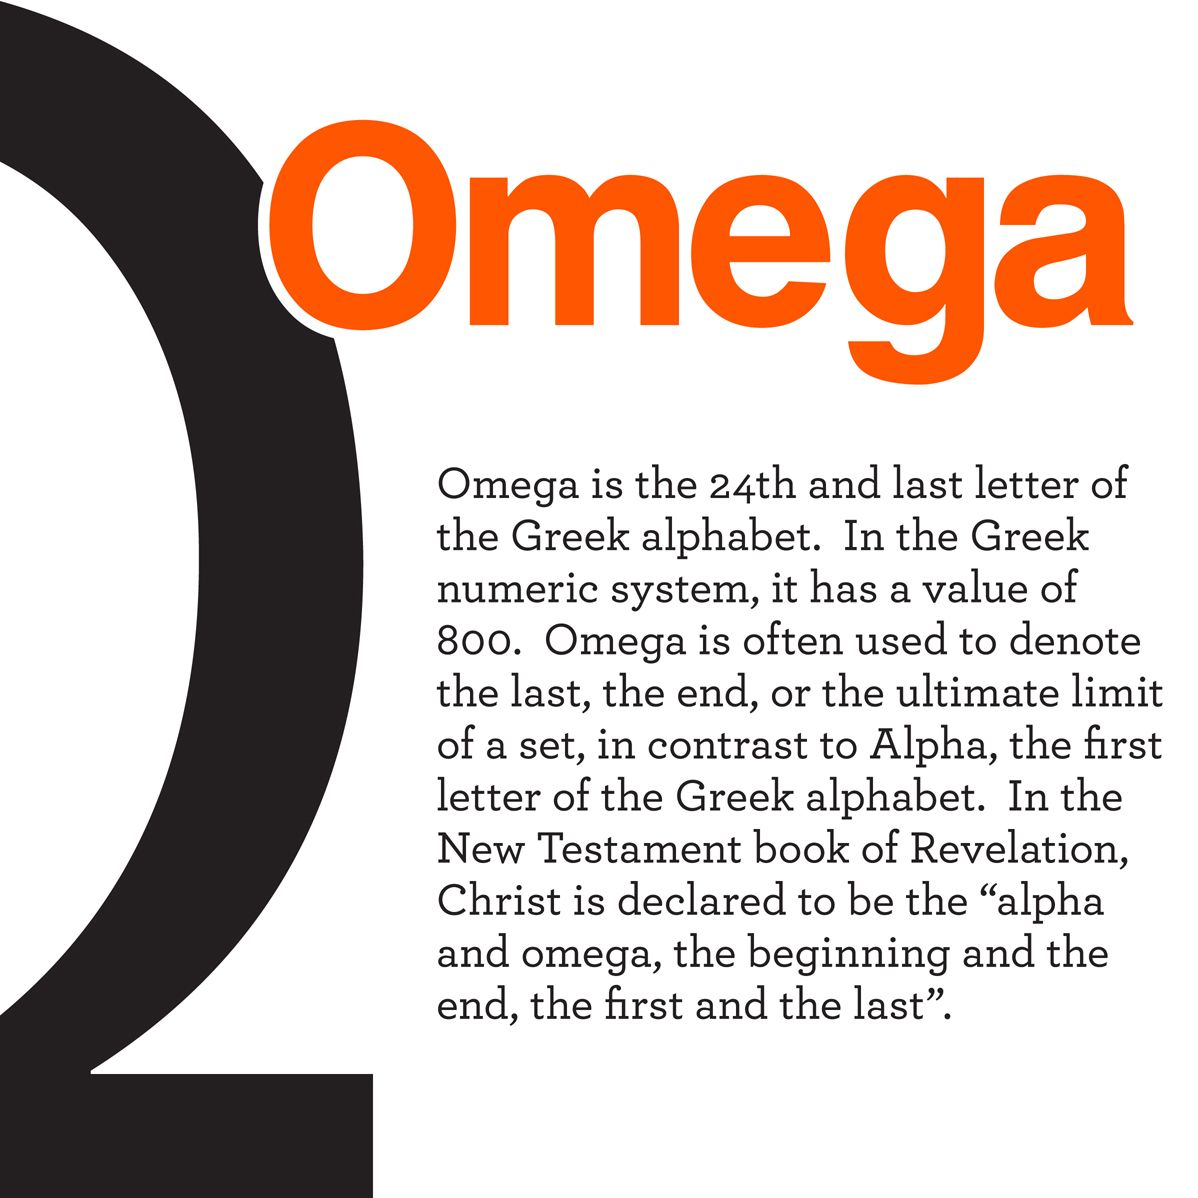 Omega symbols google search omega symbols pinterest omega omega symbols google search biocorpaavc Gallery